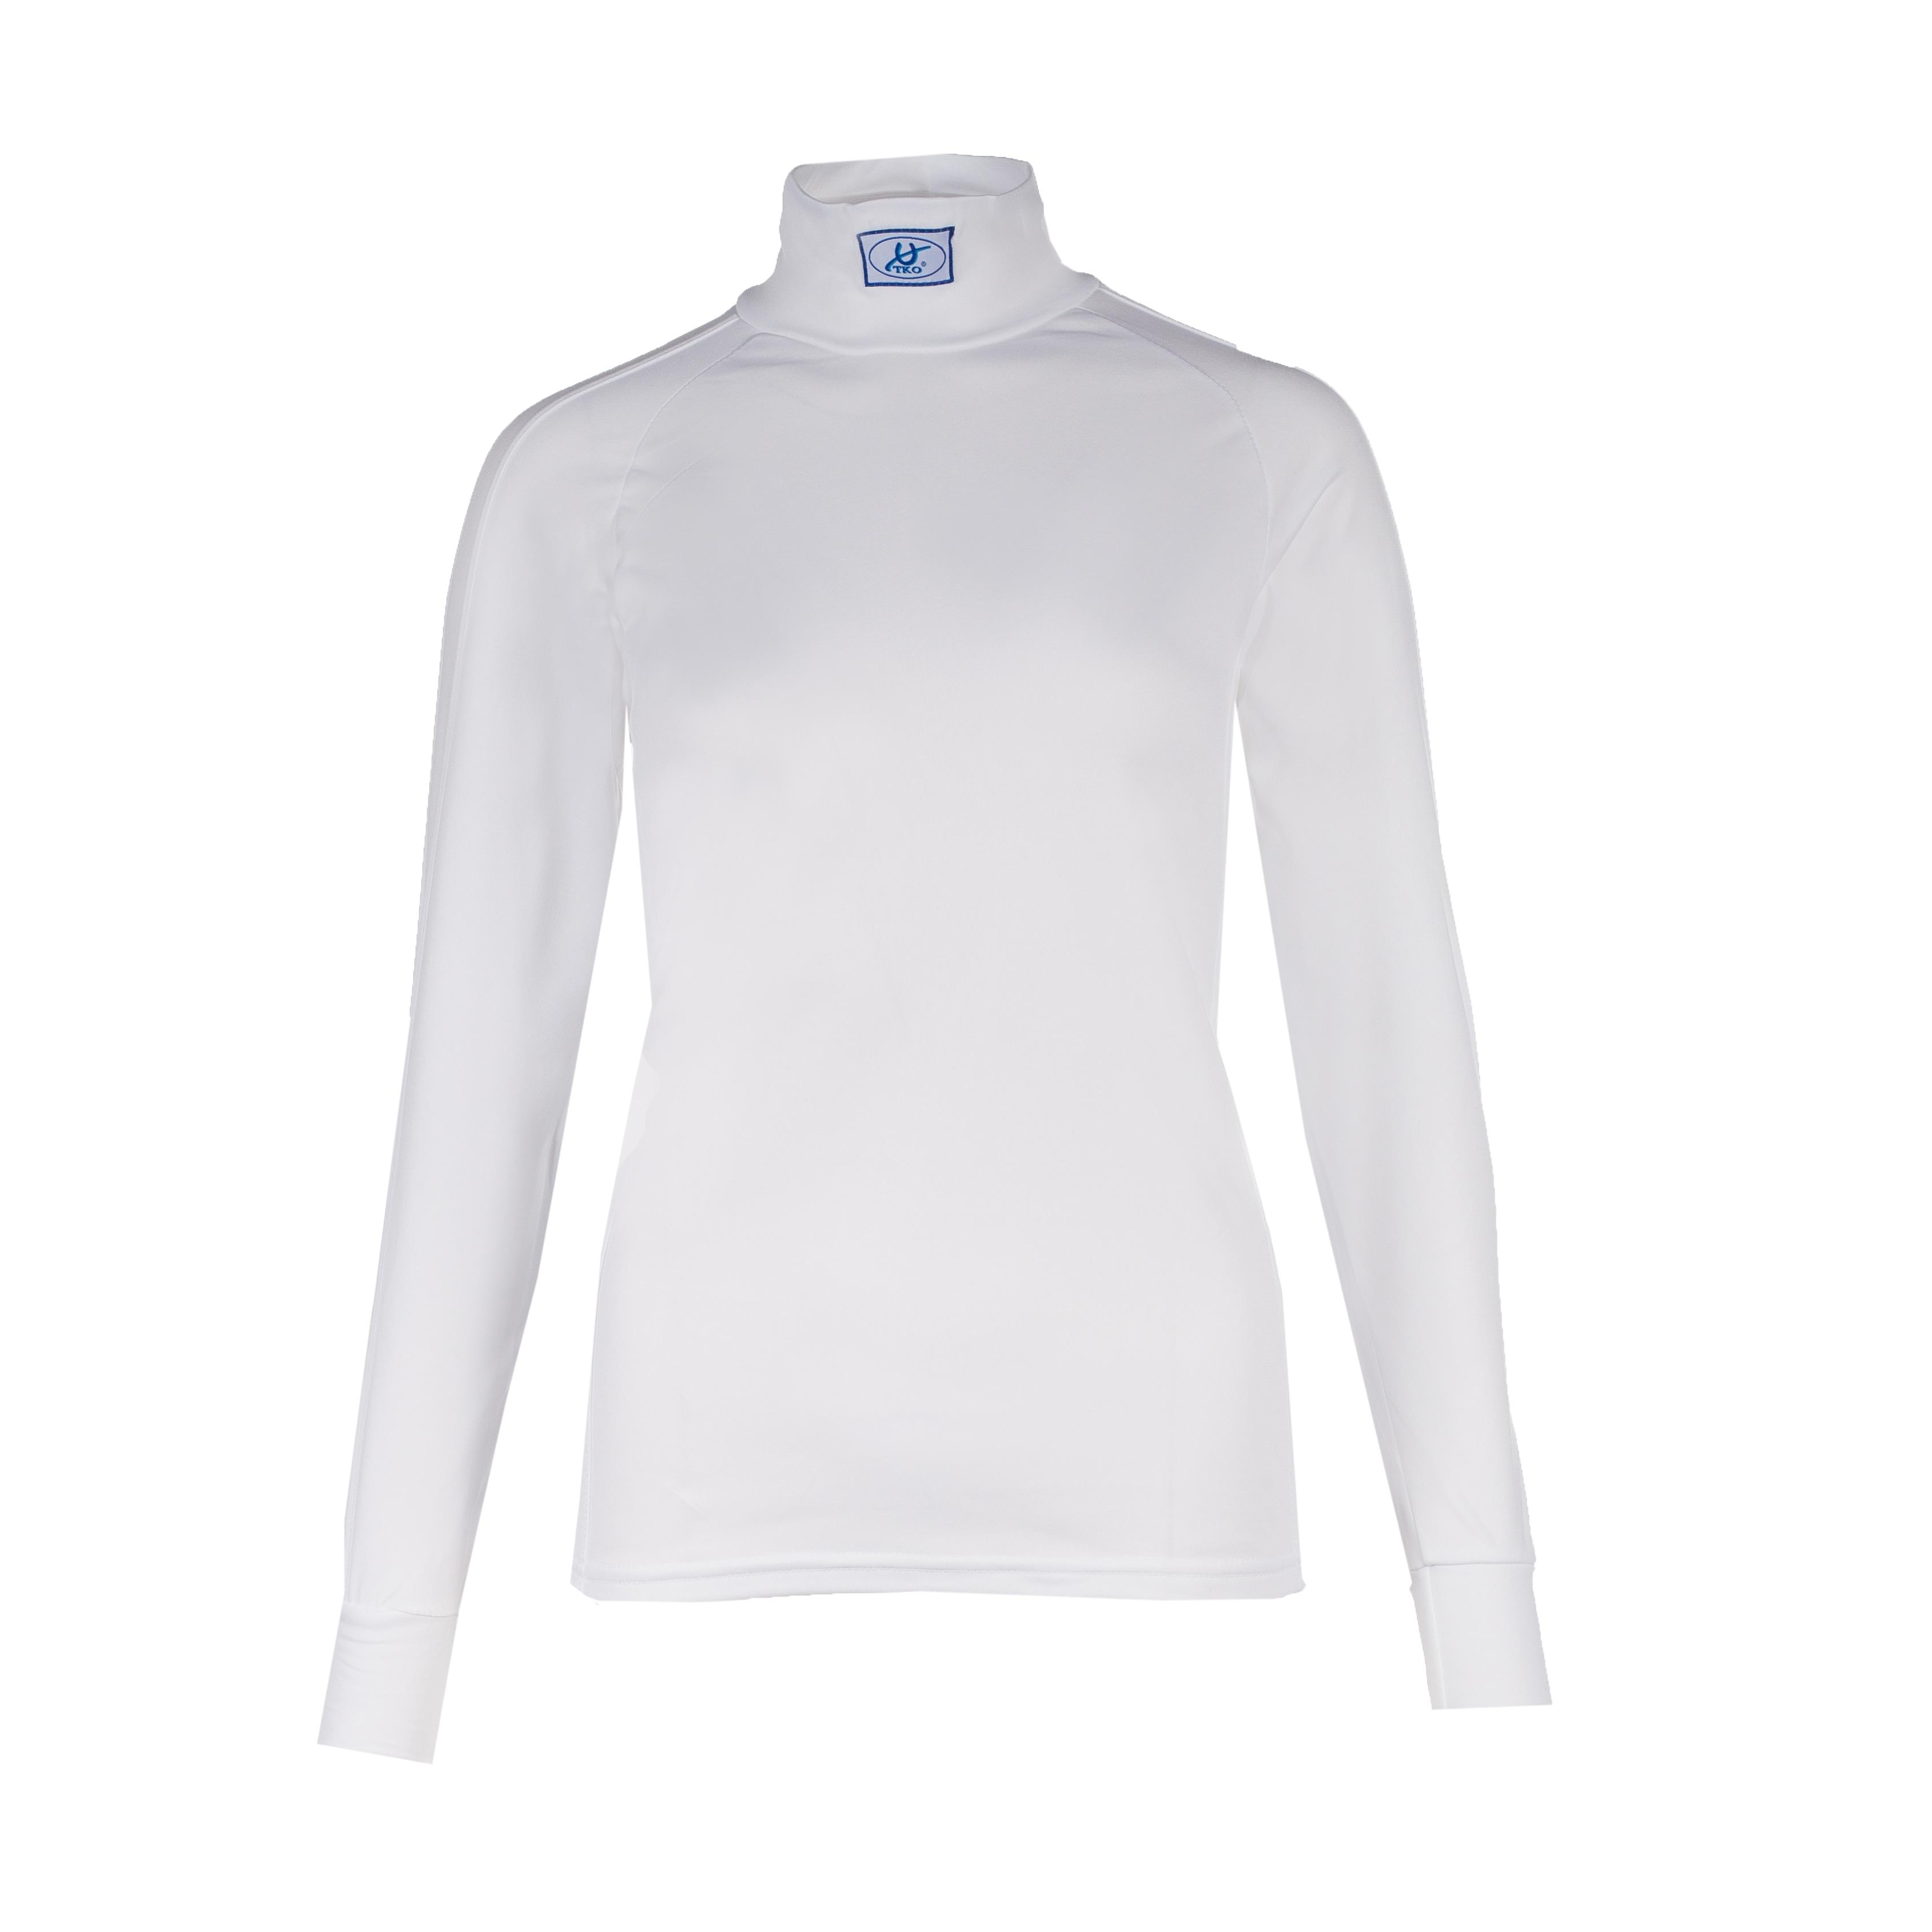 TKO Lett vinterløpsskjorte i mikrofleece